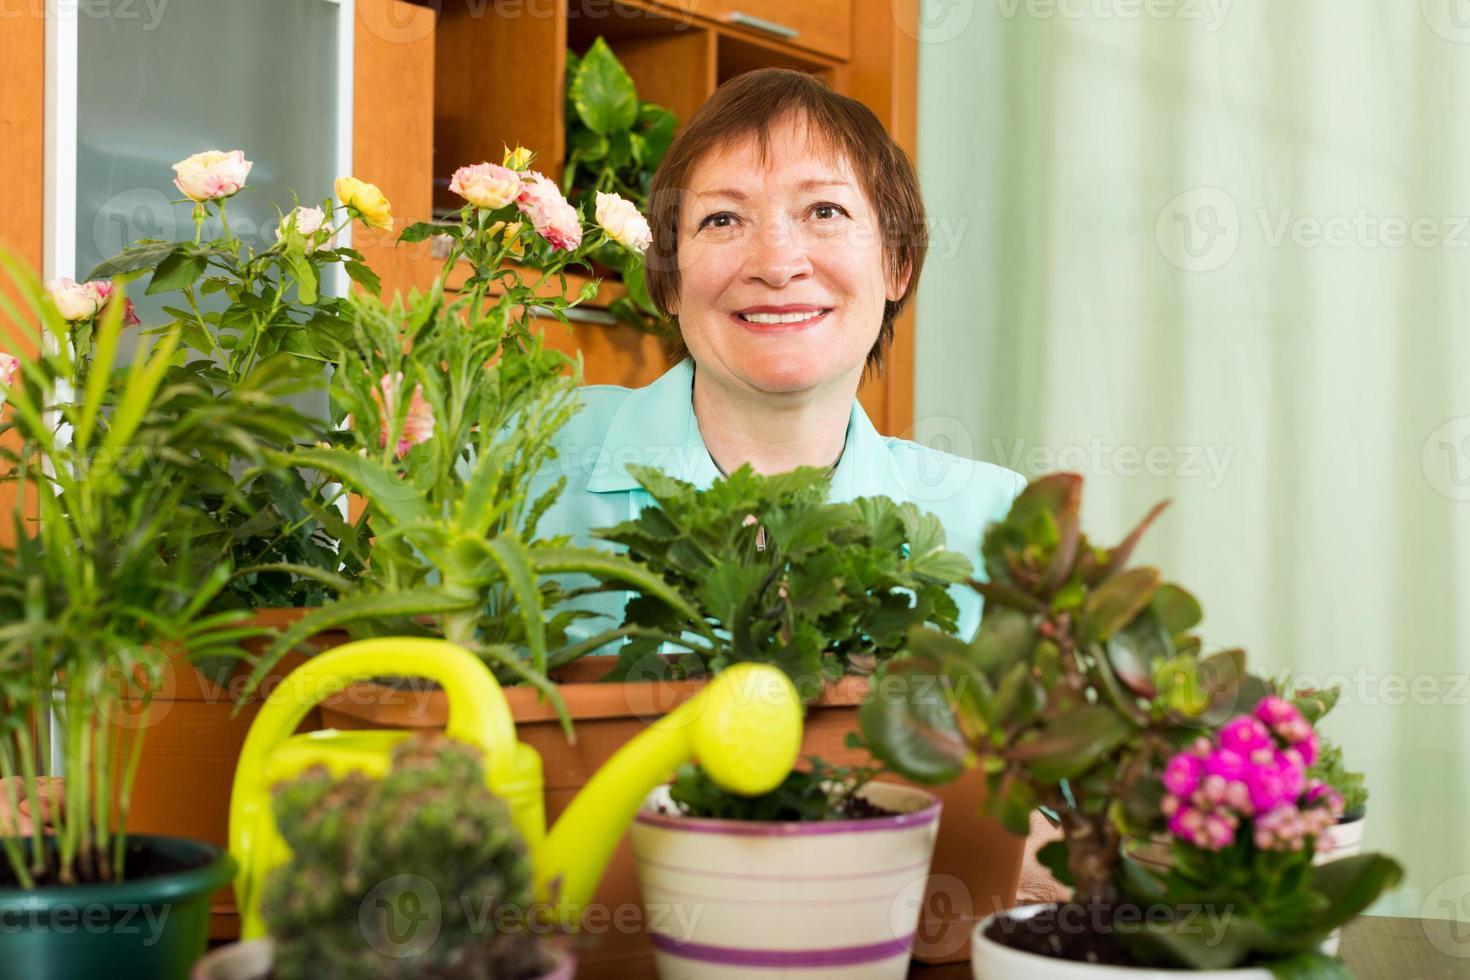 jardineiro maduro feminino com plantas sorrindo foto